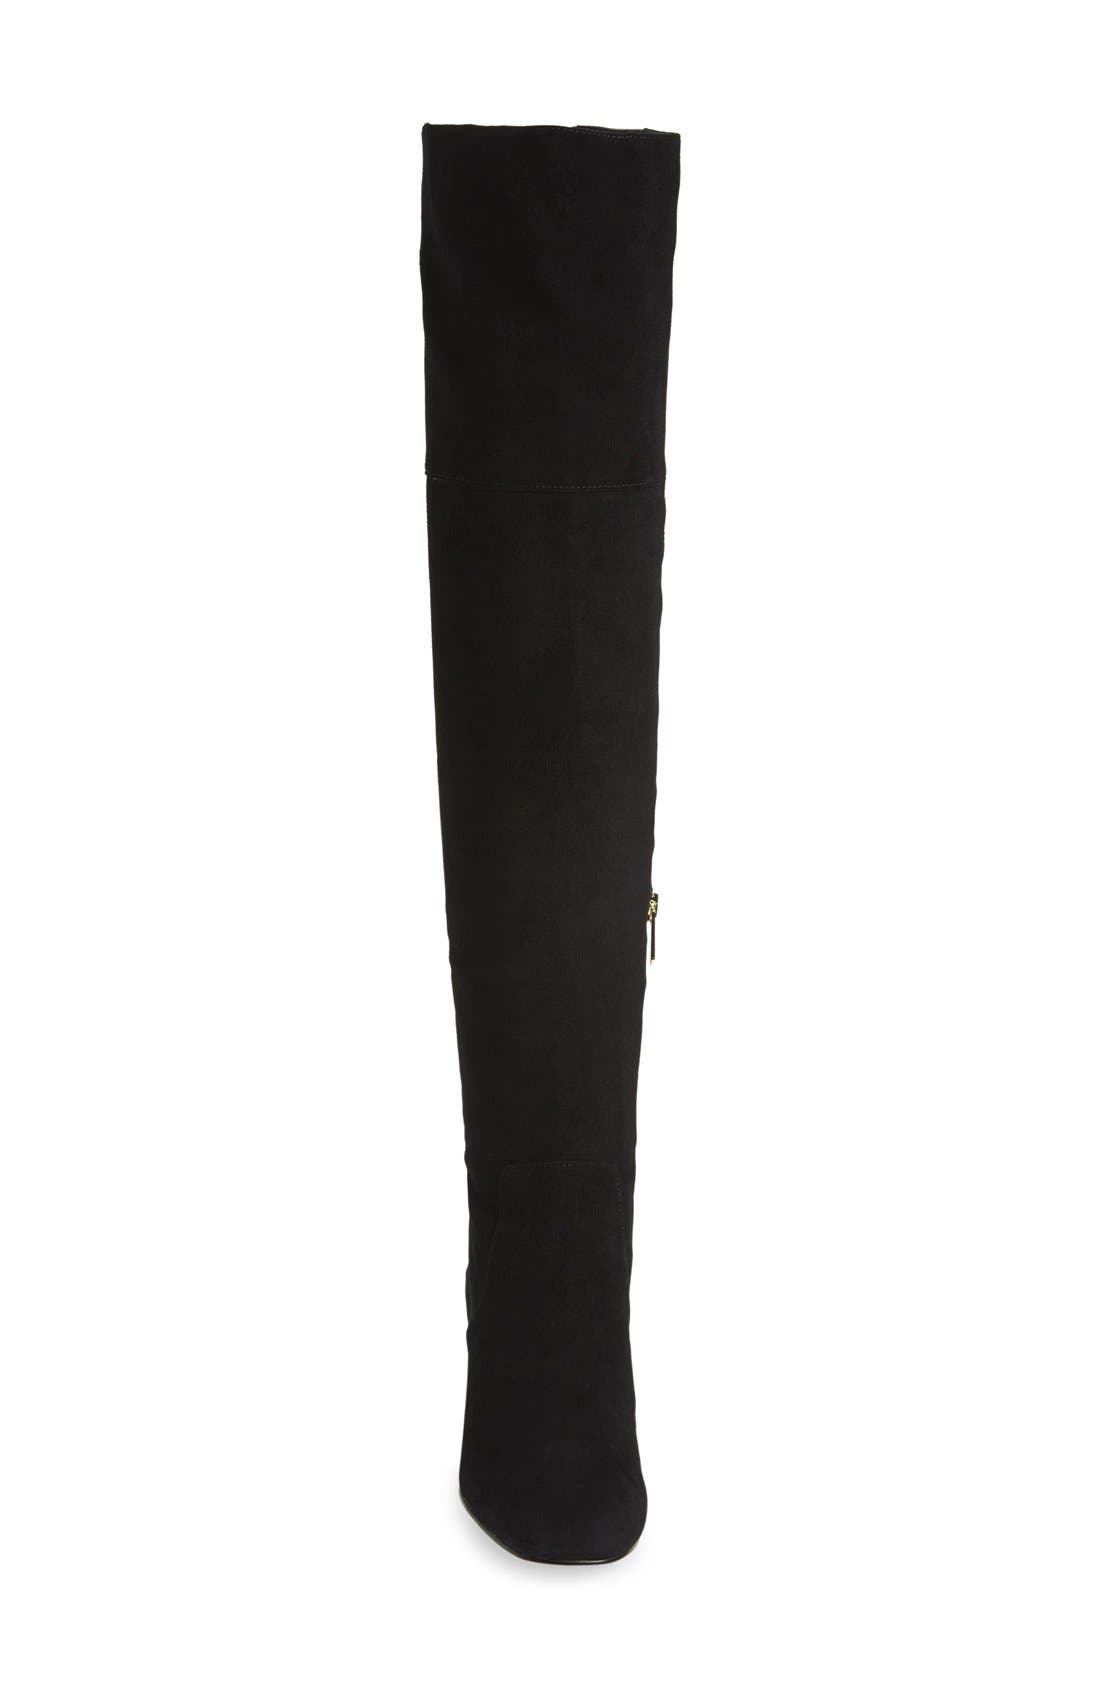 Alternate Image 3  - Sam Edelman 'Elina' Over the Knee Boot (Women)